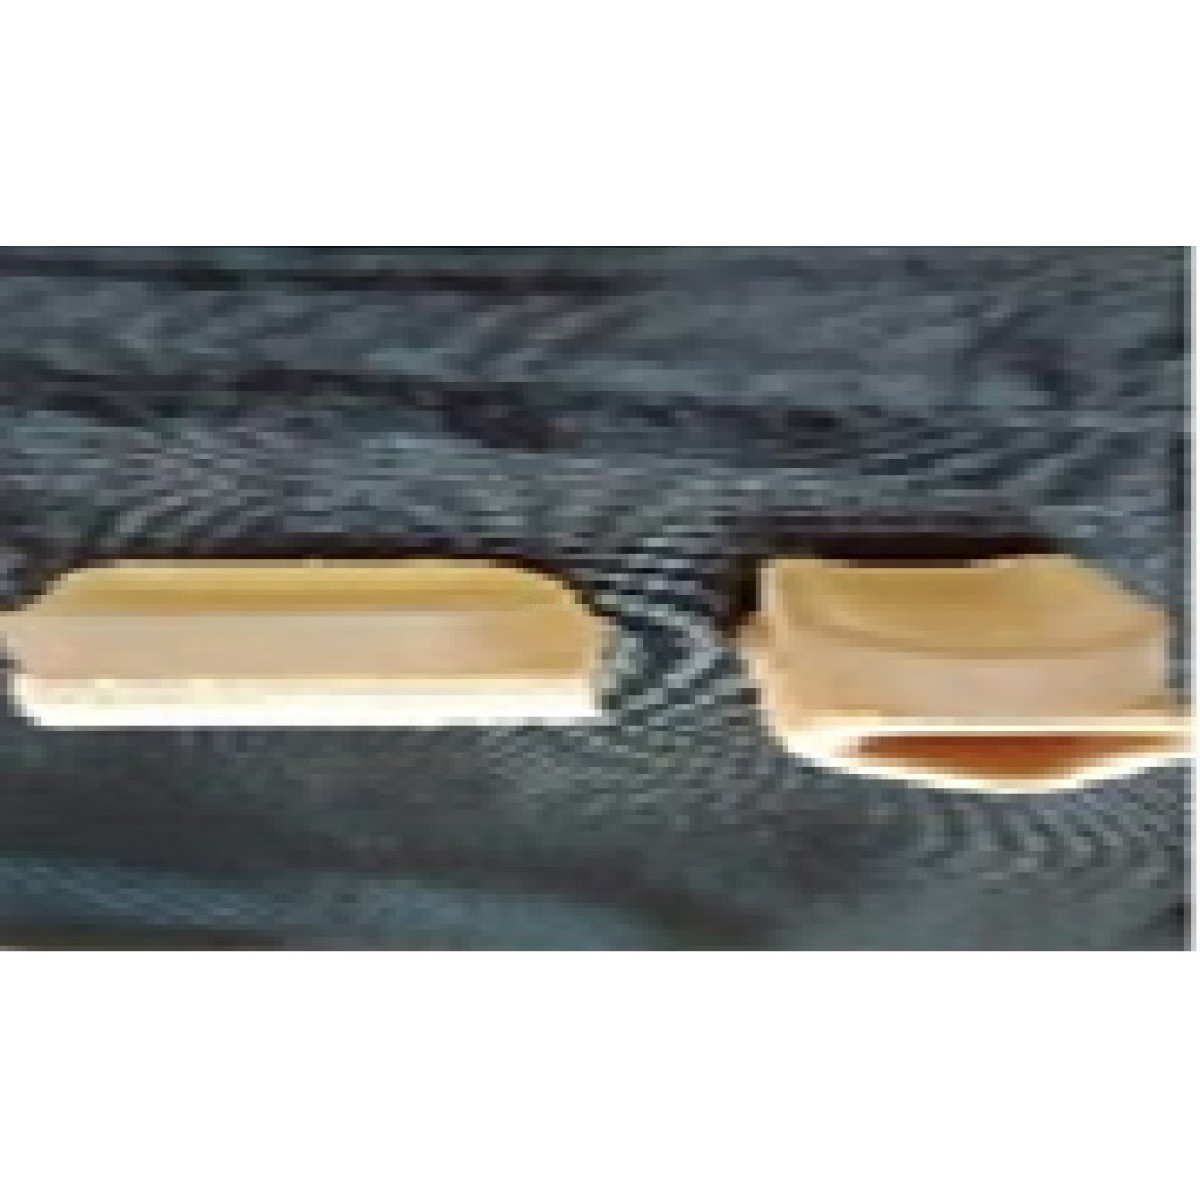 Перегородка межпальцевая с петлей на первый палец стопы на тканевой основе (цена за пару)